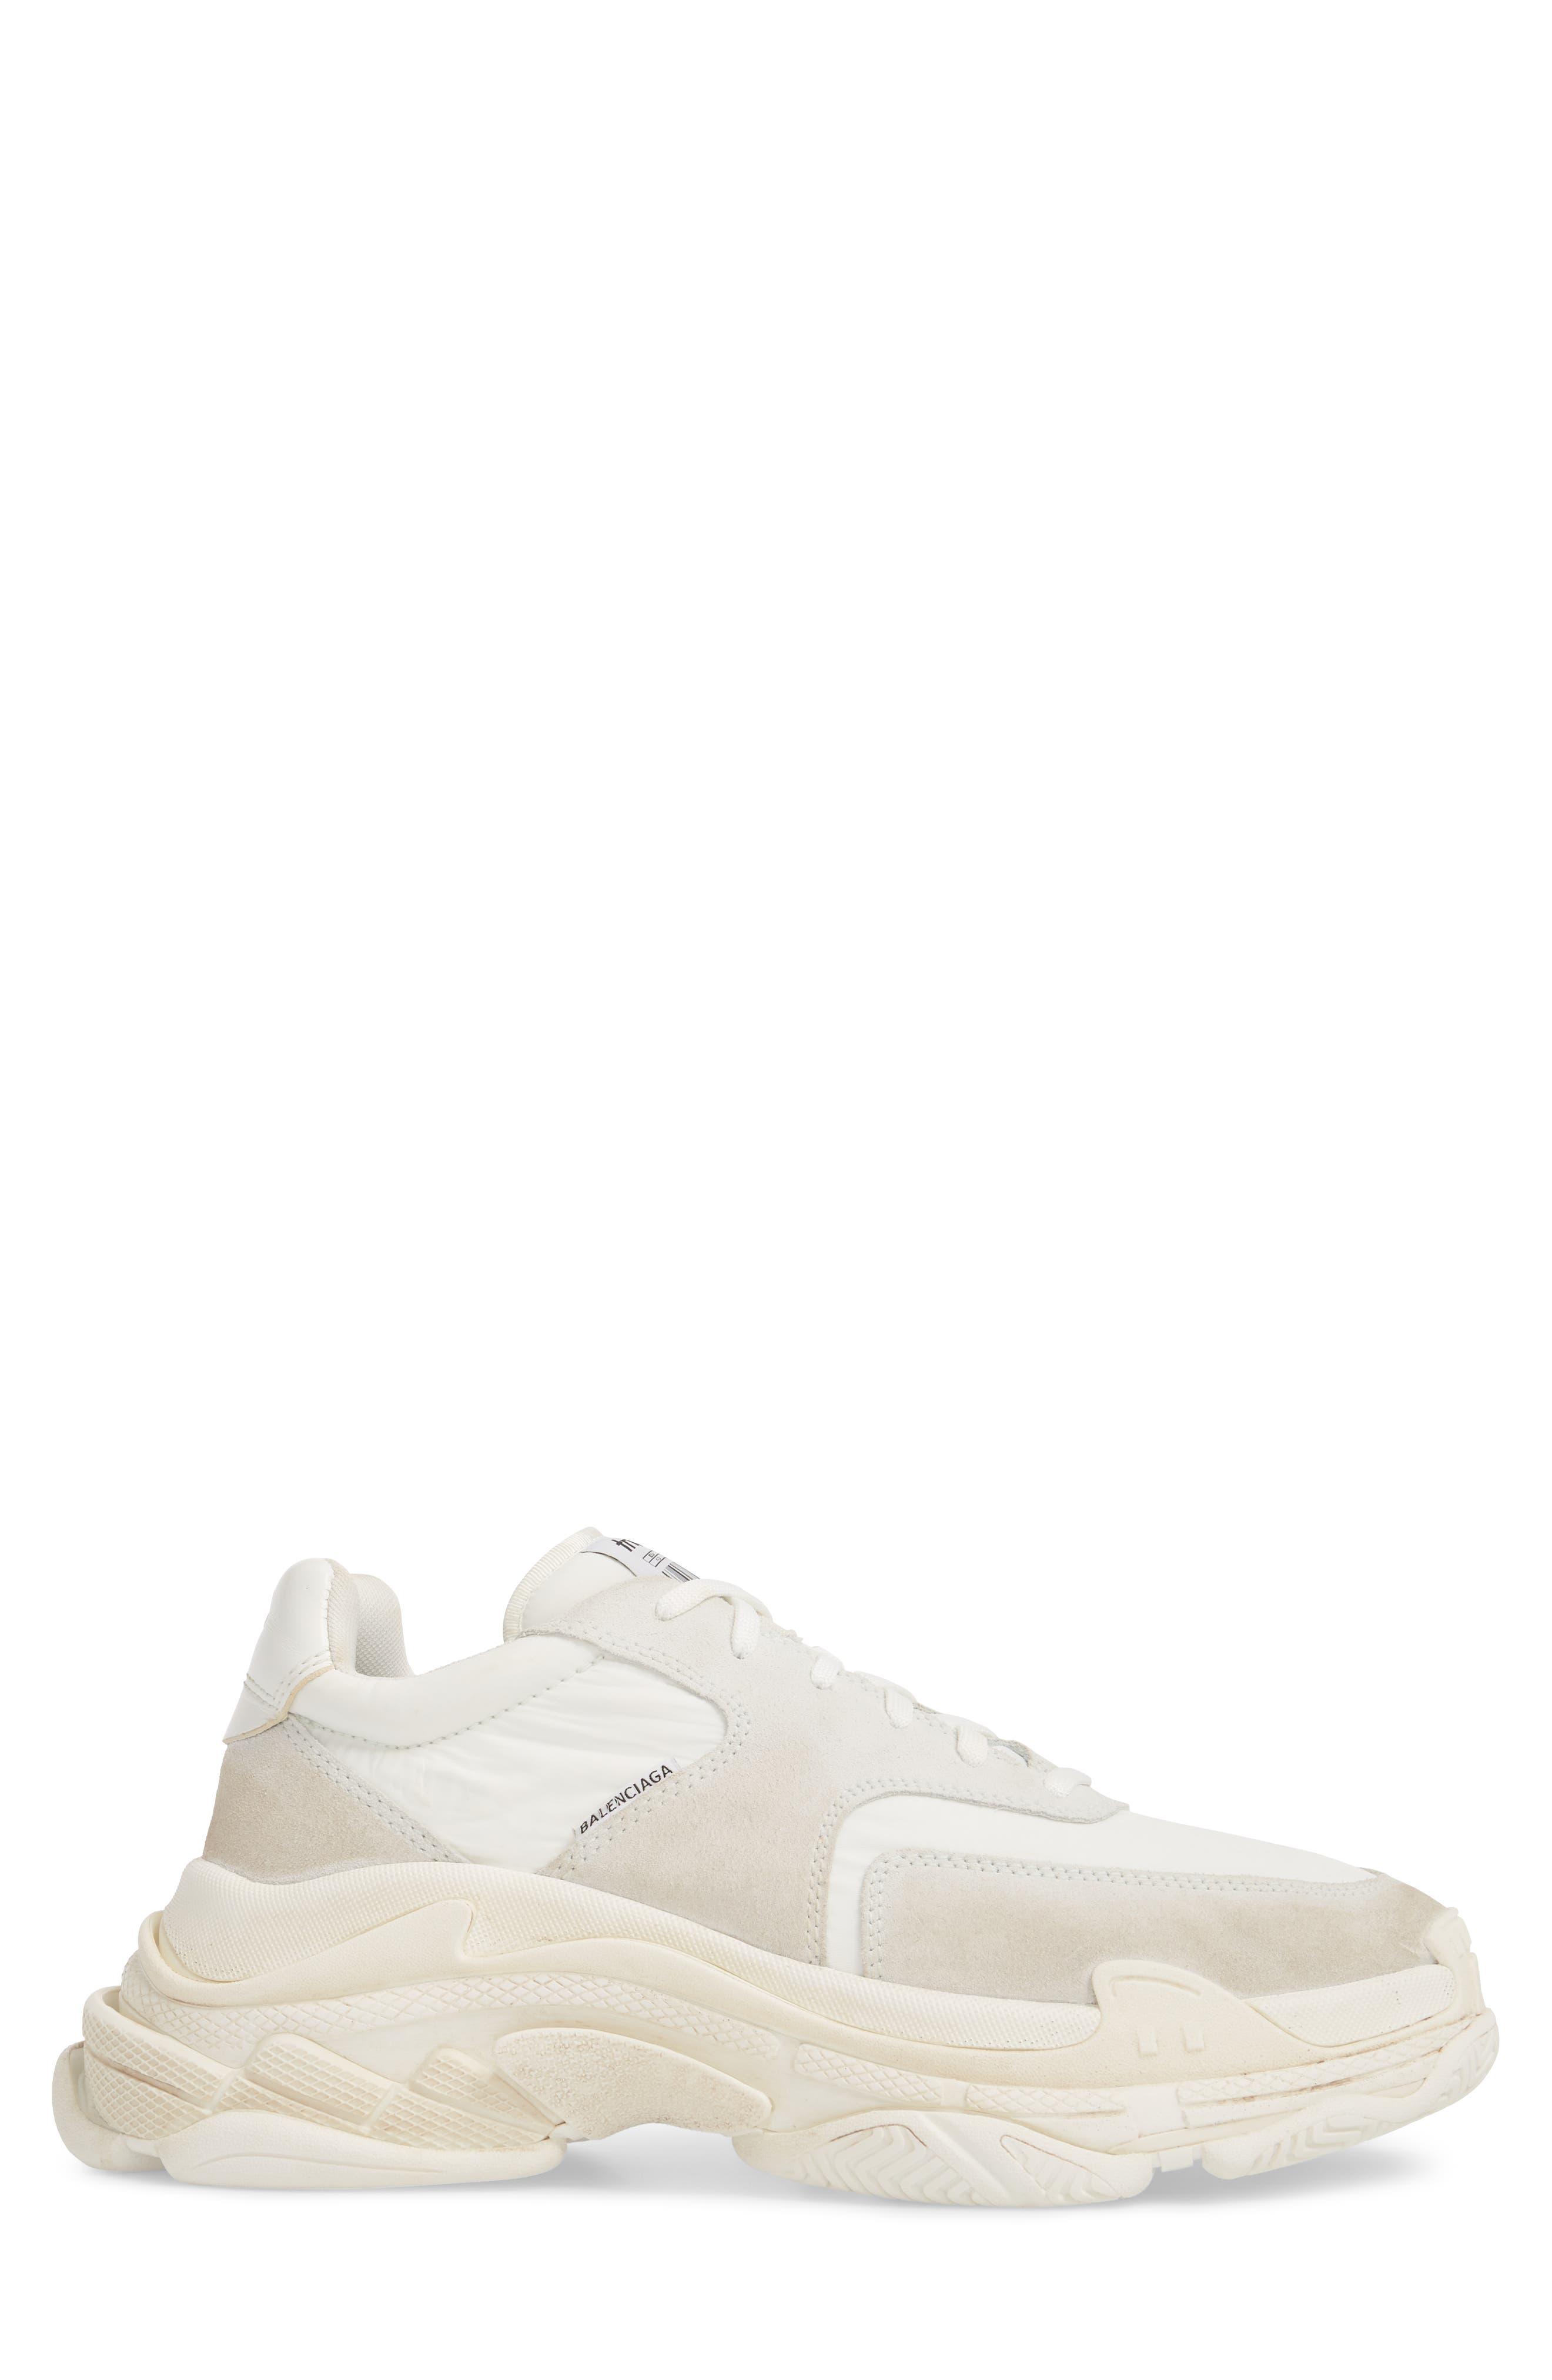 Triple S Retro Sneaker,                             Alternate thumbnail 3, color,                             Blanc White